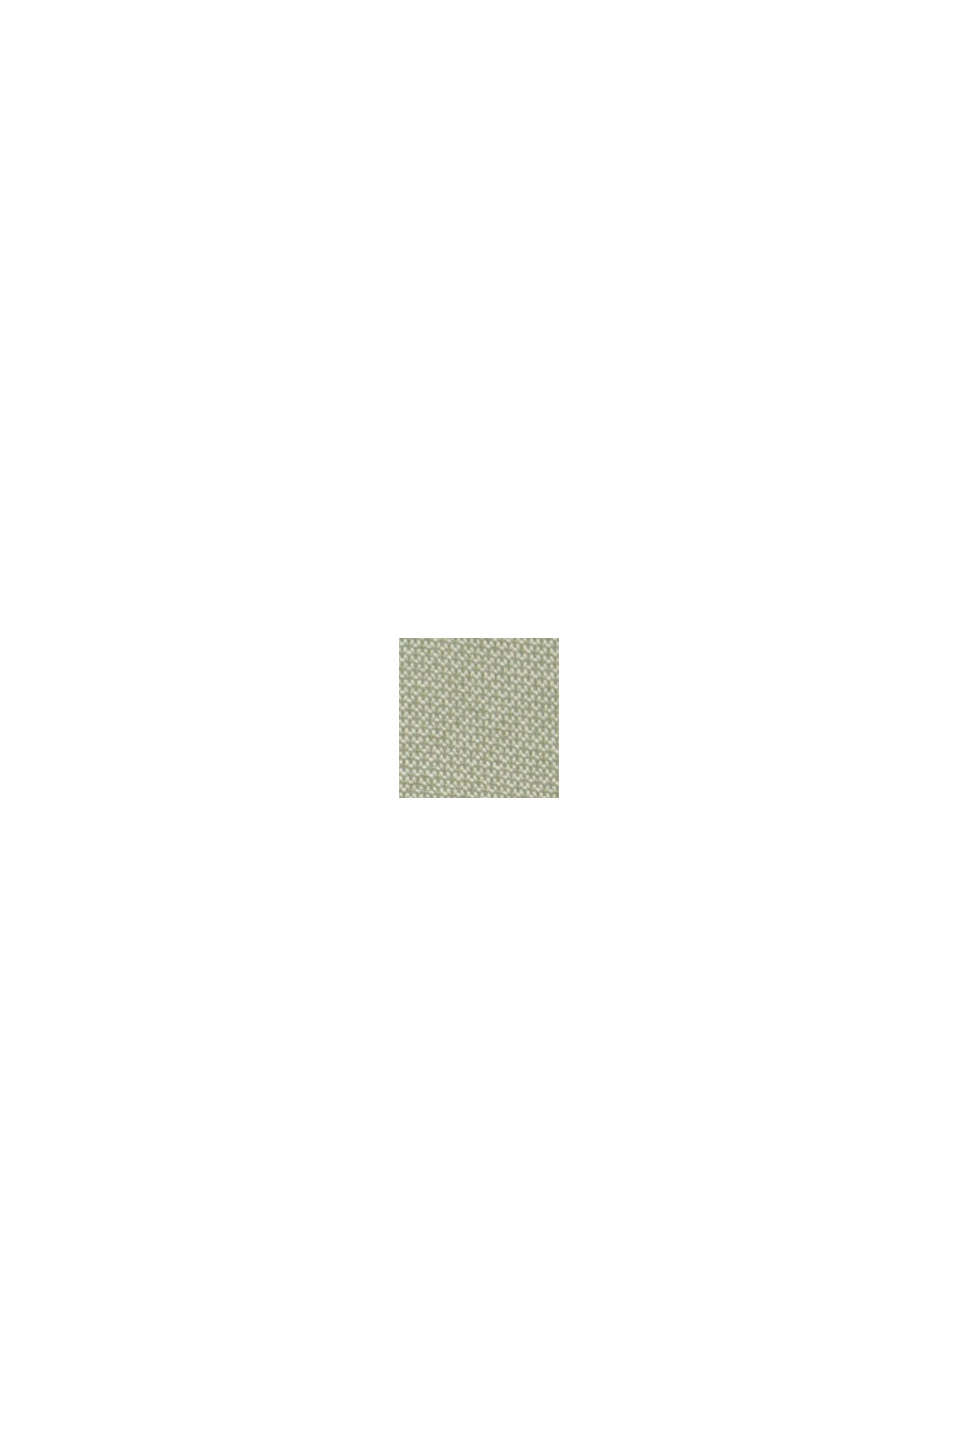 CURVY - Abrigo corto con textura, LIGHT KHAKI, swatch